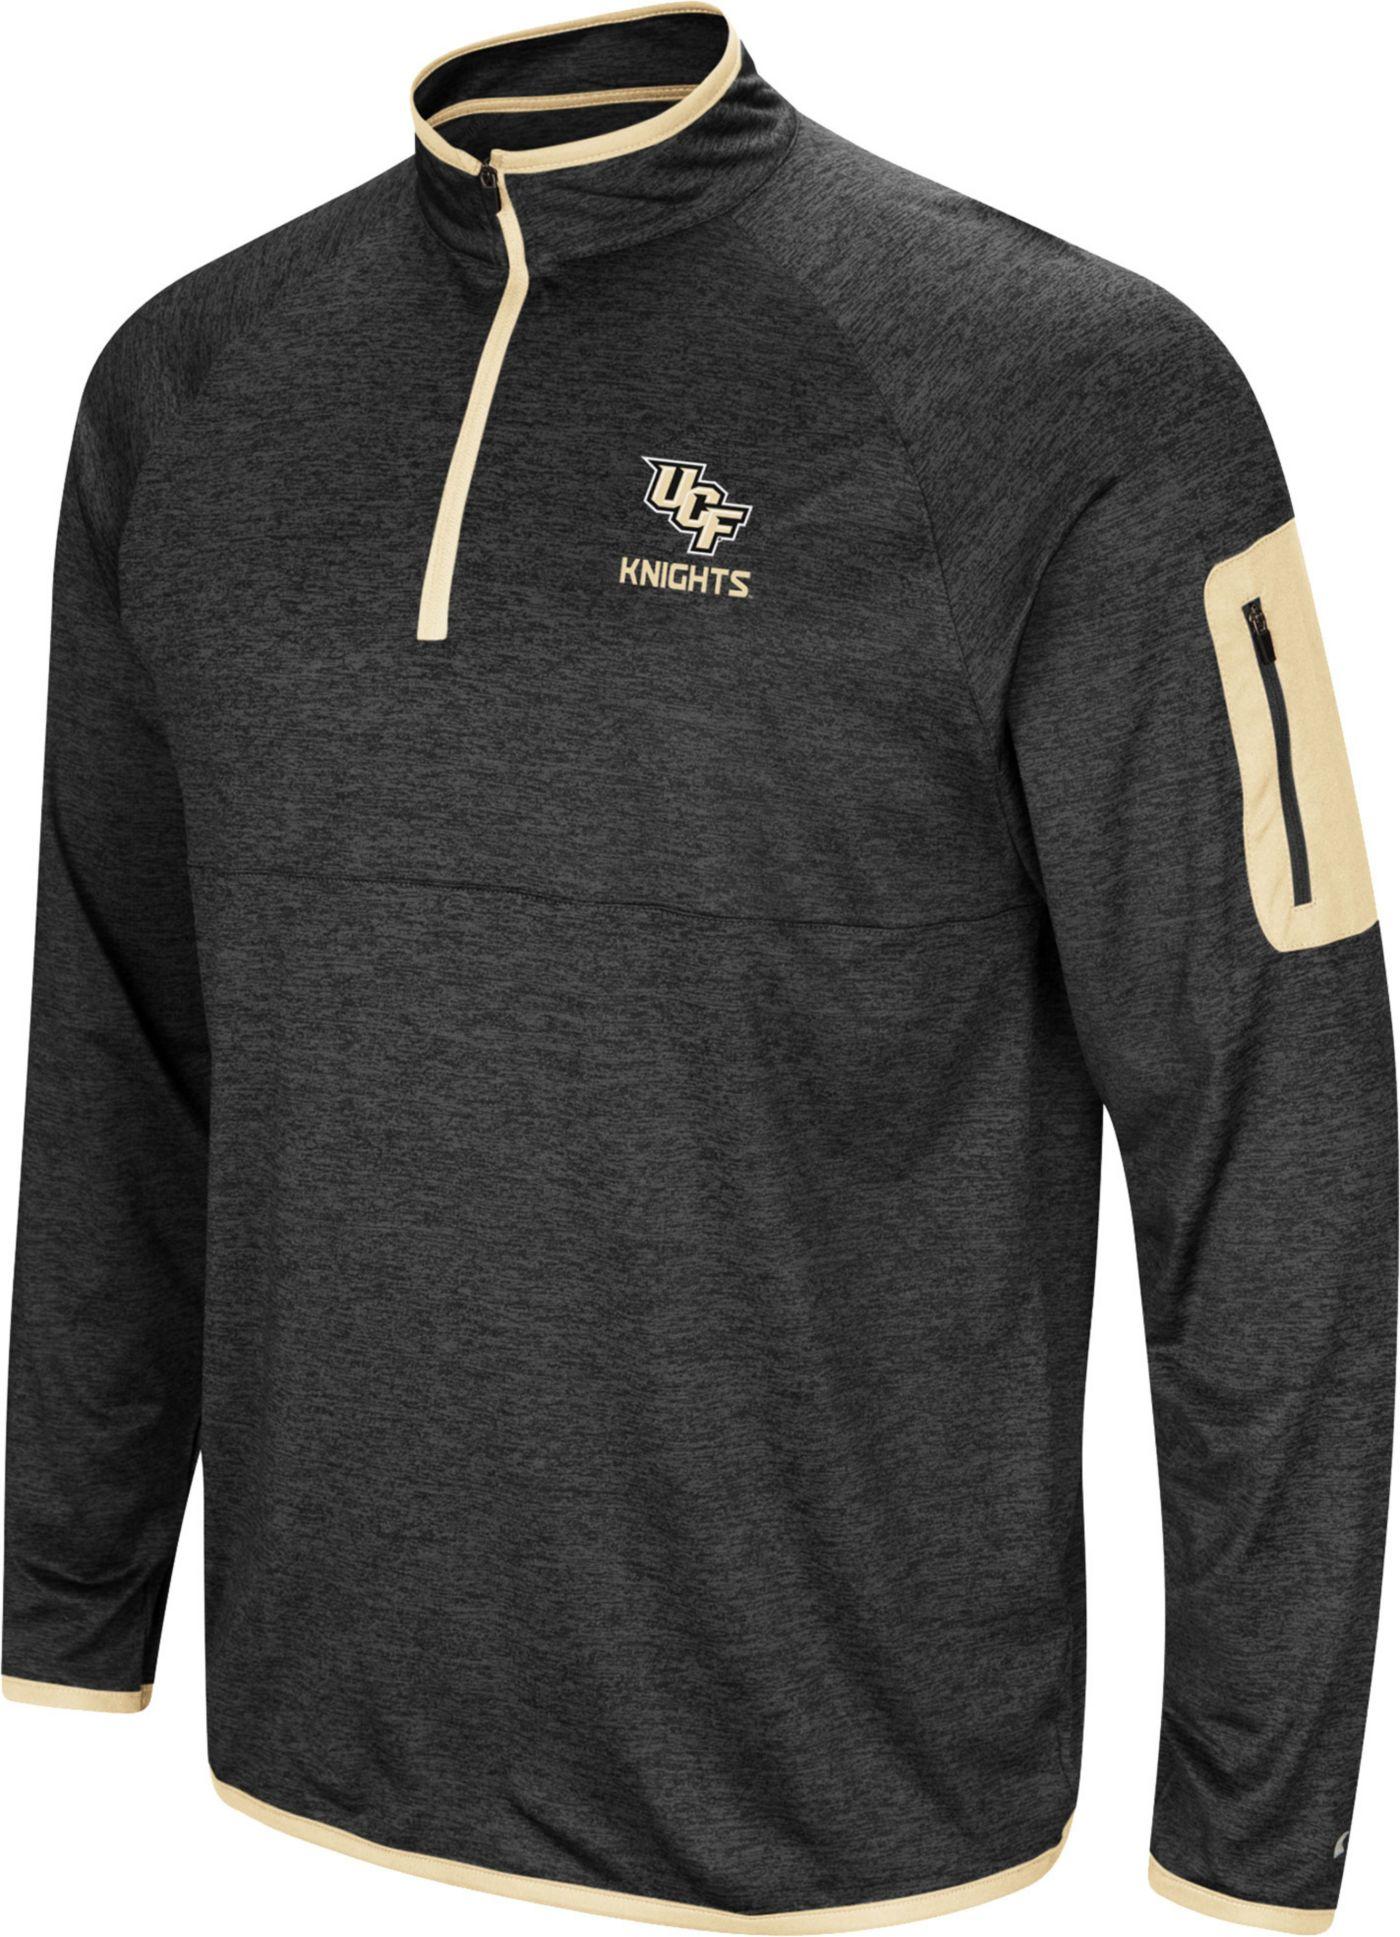 Colosseum Men's UCF Knights Indus River Quarter-Zip Black Shirt